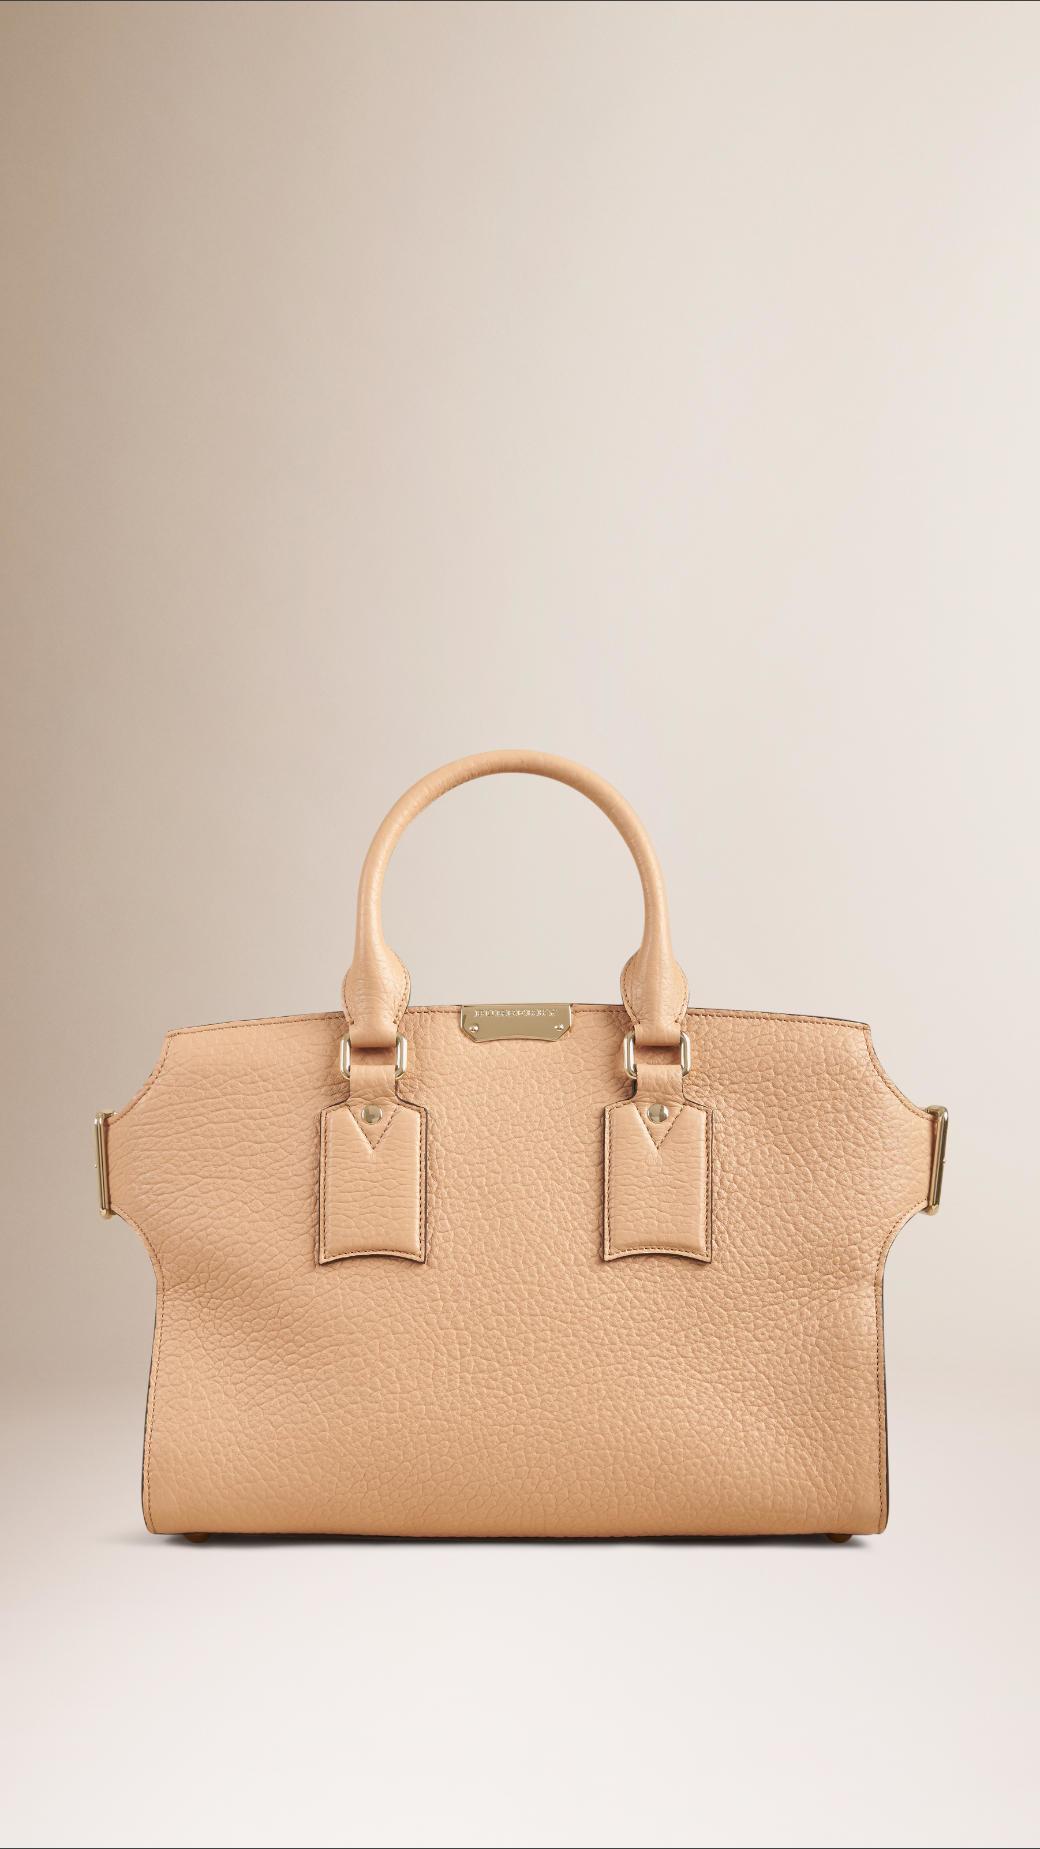 fc9503a858f3 Gallery. Women s Burberry Canter Women s Louis Vuitton Totally Women s  Plaid Bags ...